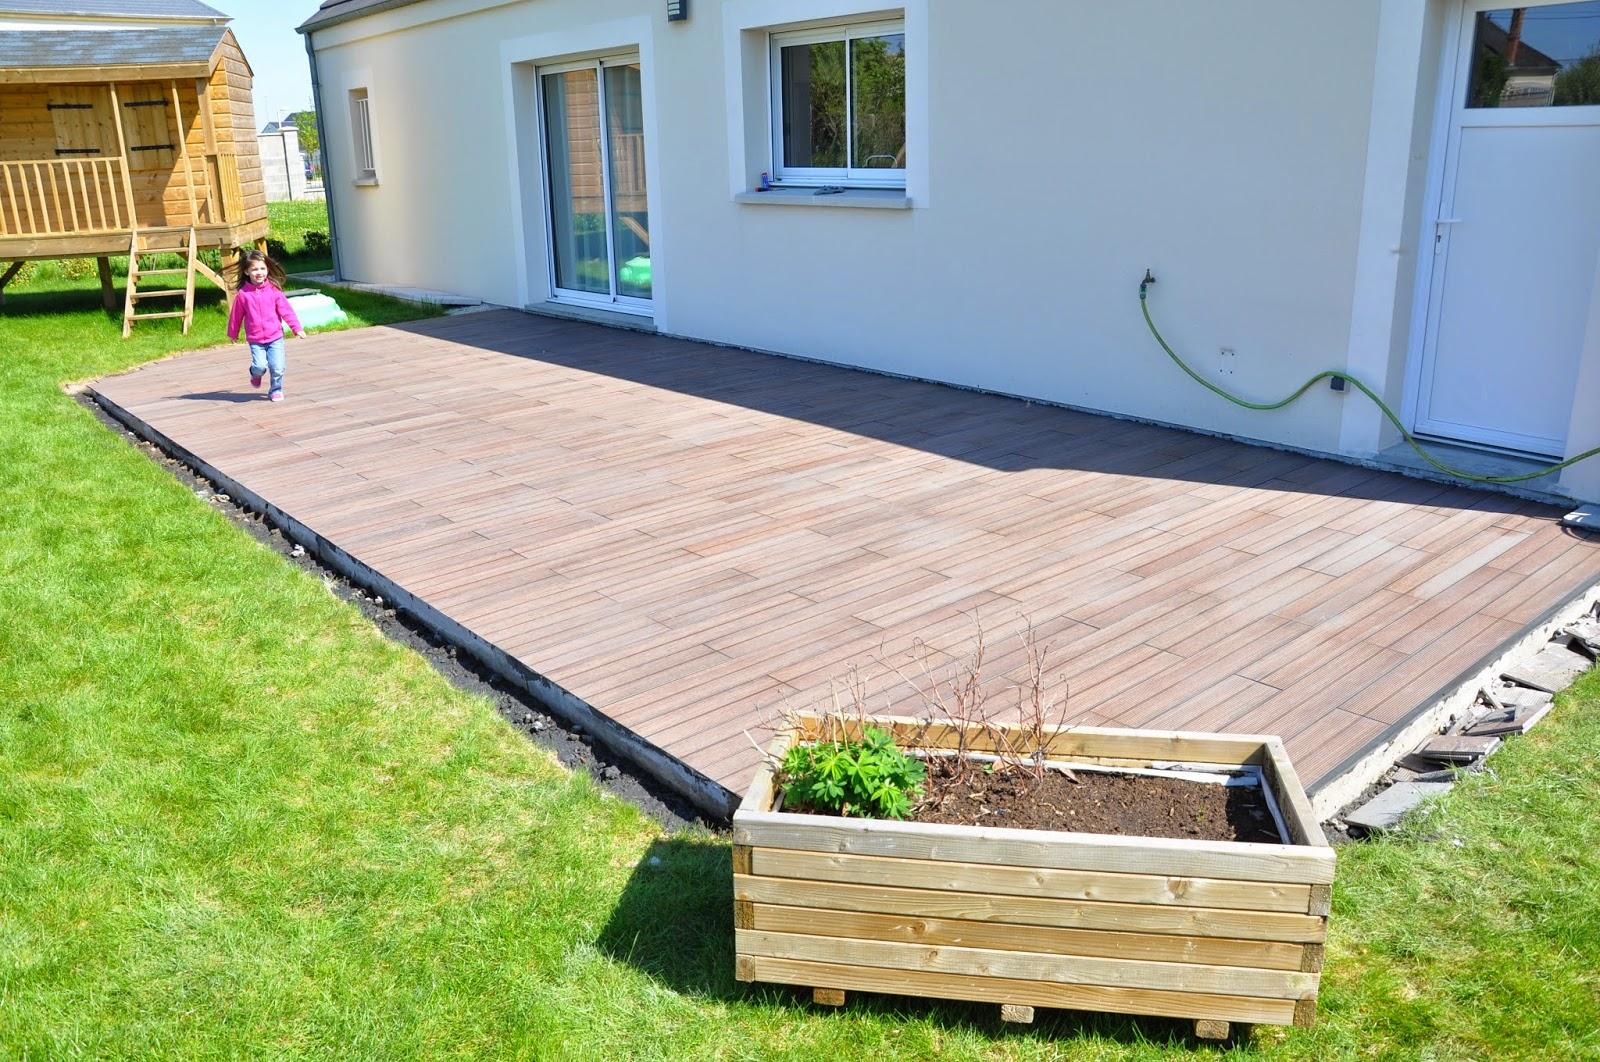 carreler une terrasse comment commencer pour carreler une terrasse carreler une terrasse elle. Black Bedroom Furniture Sets. Home Design Ideas